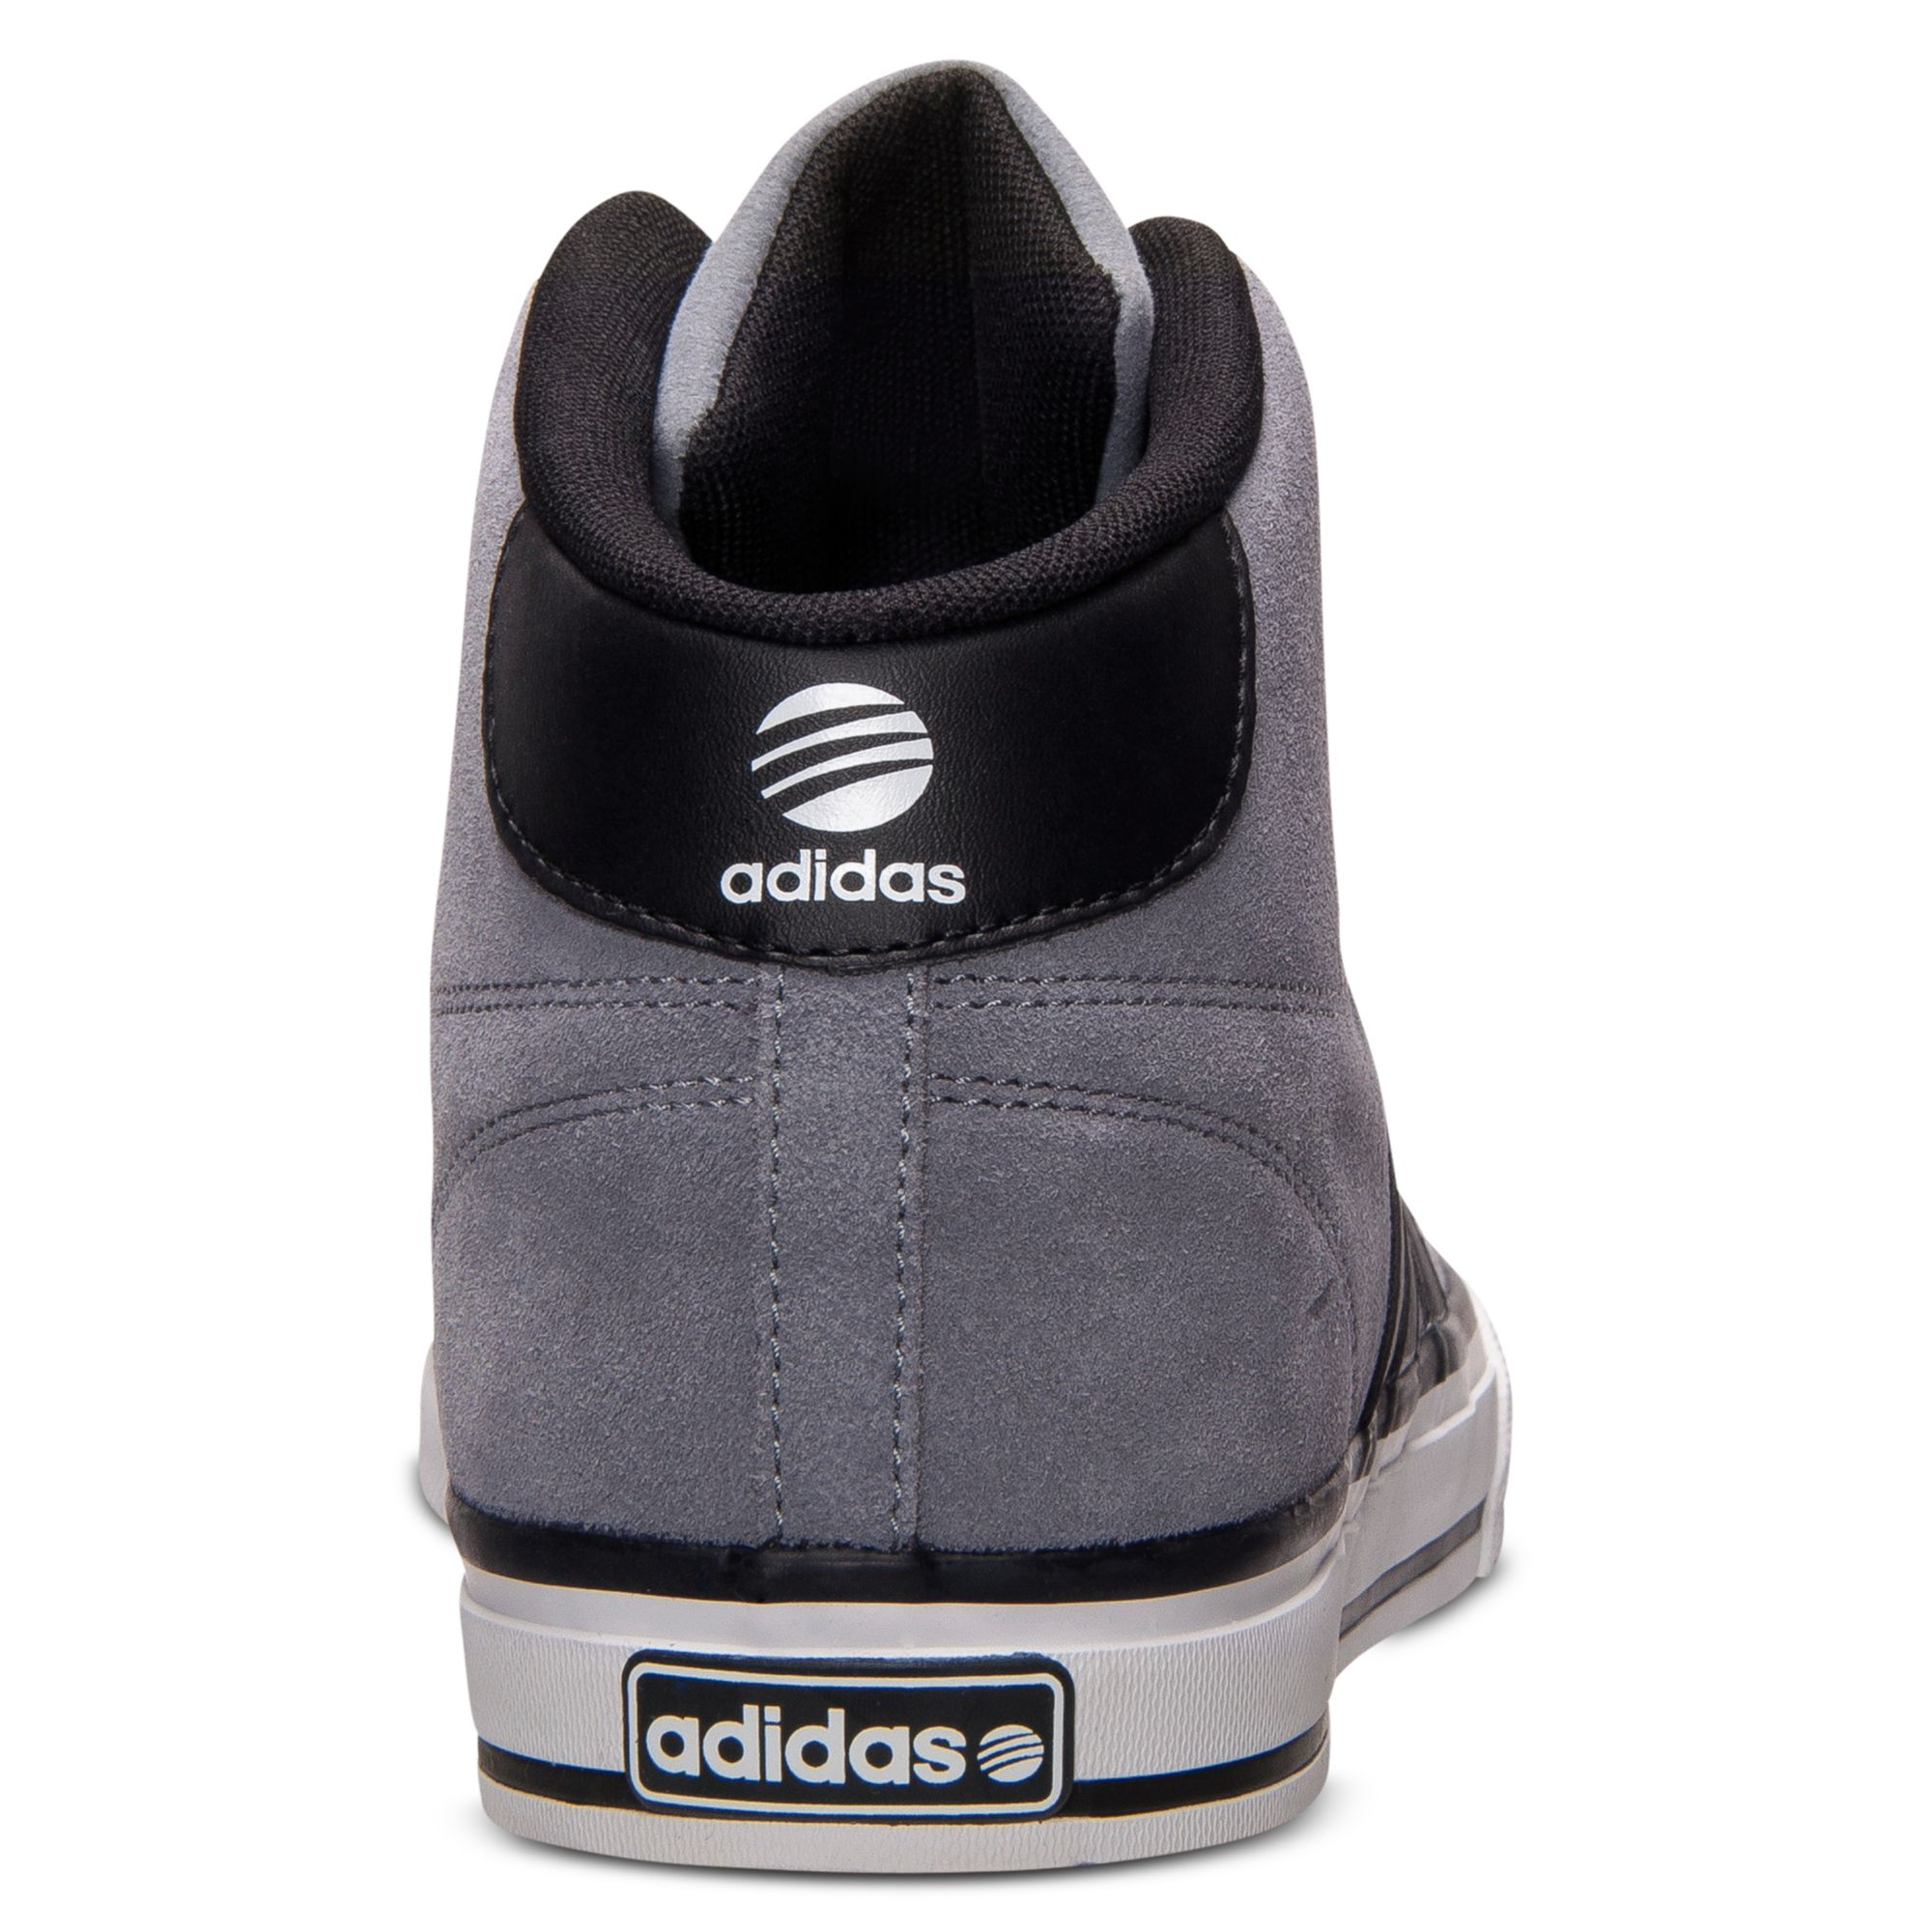 adidas neo daily vulc mid